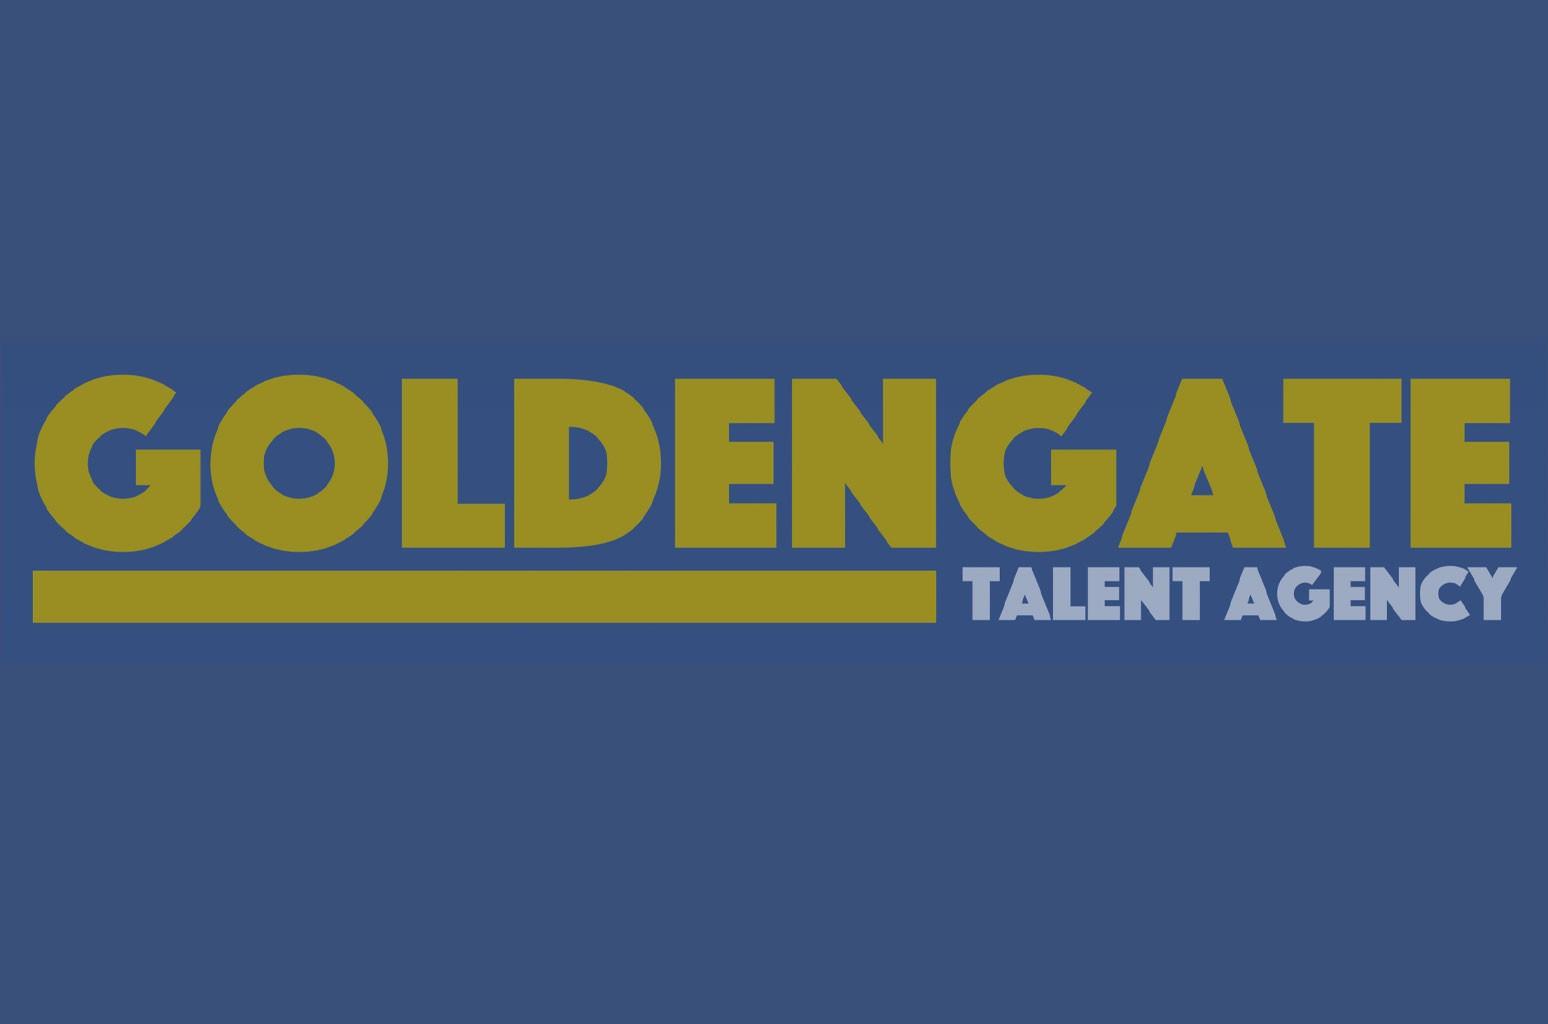 Goldengate Talent Agency